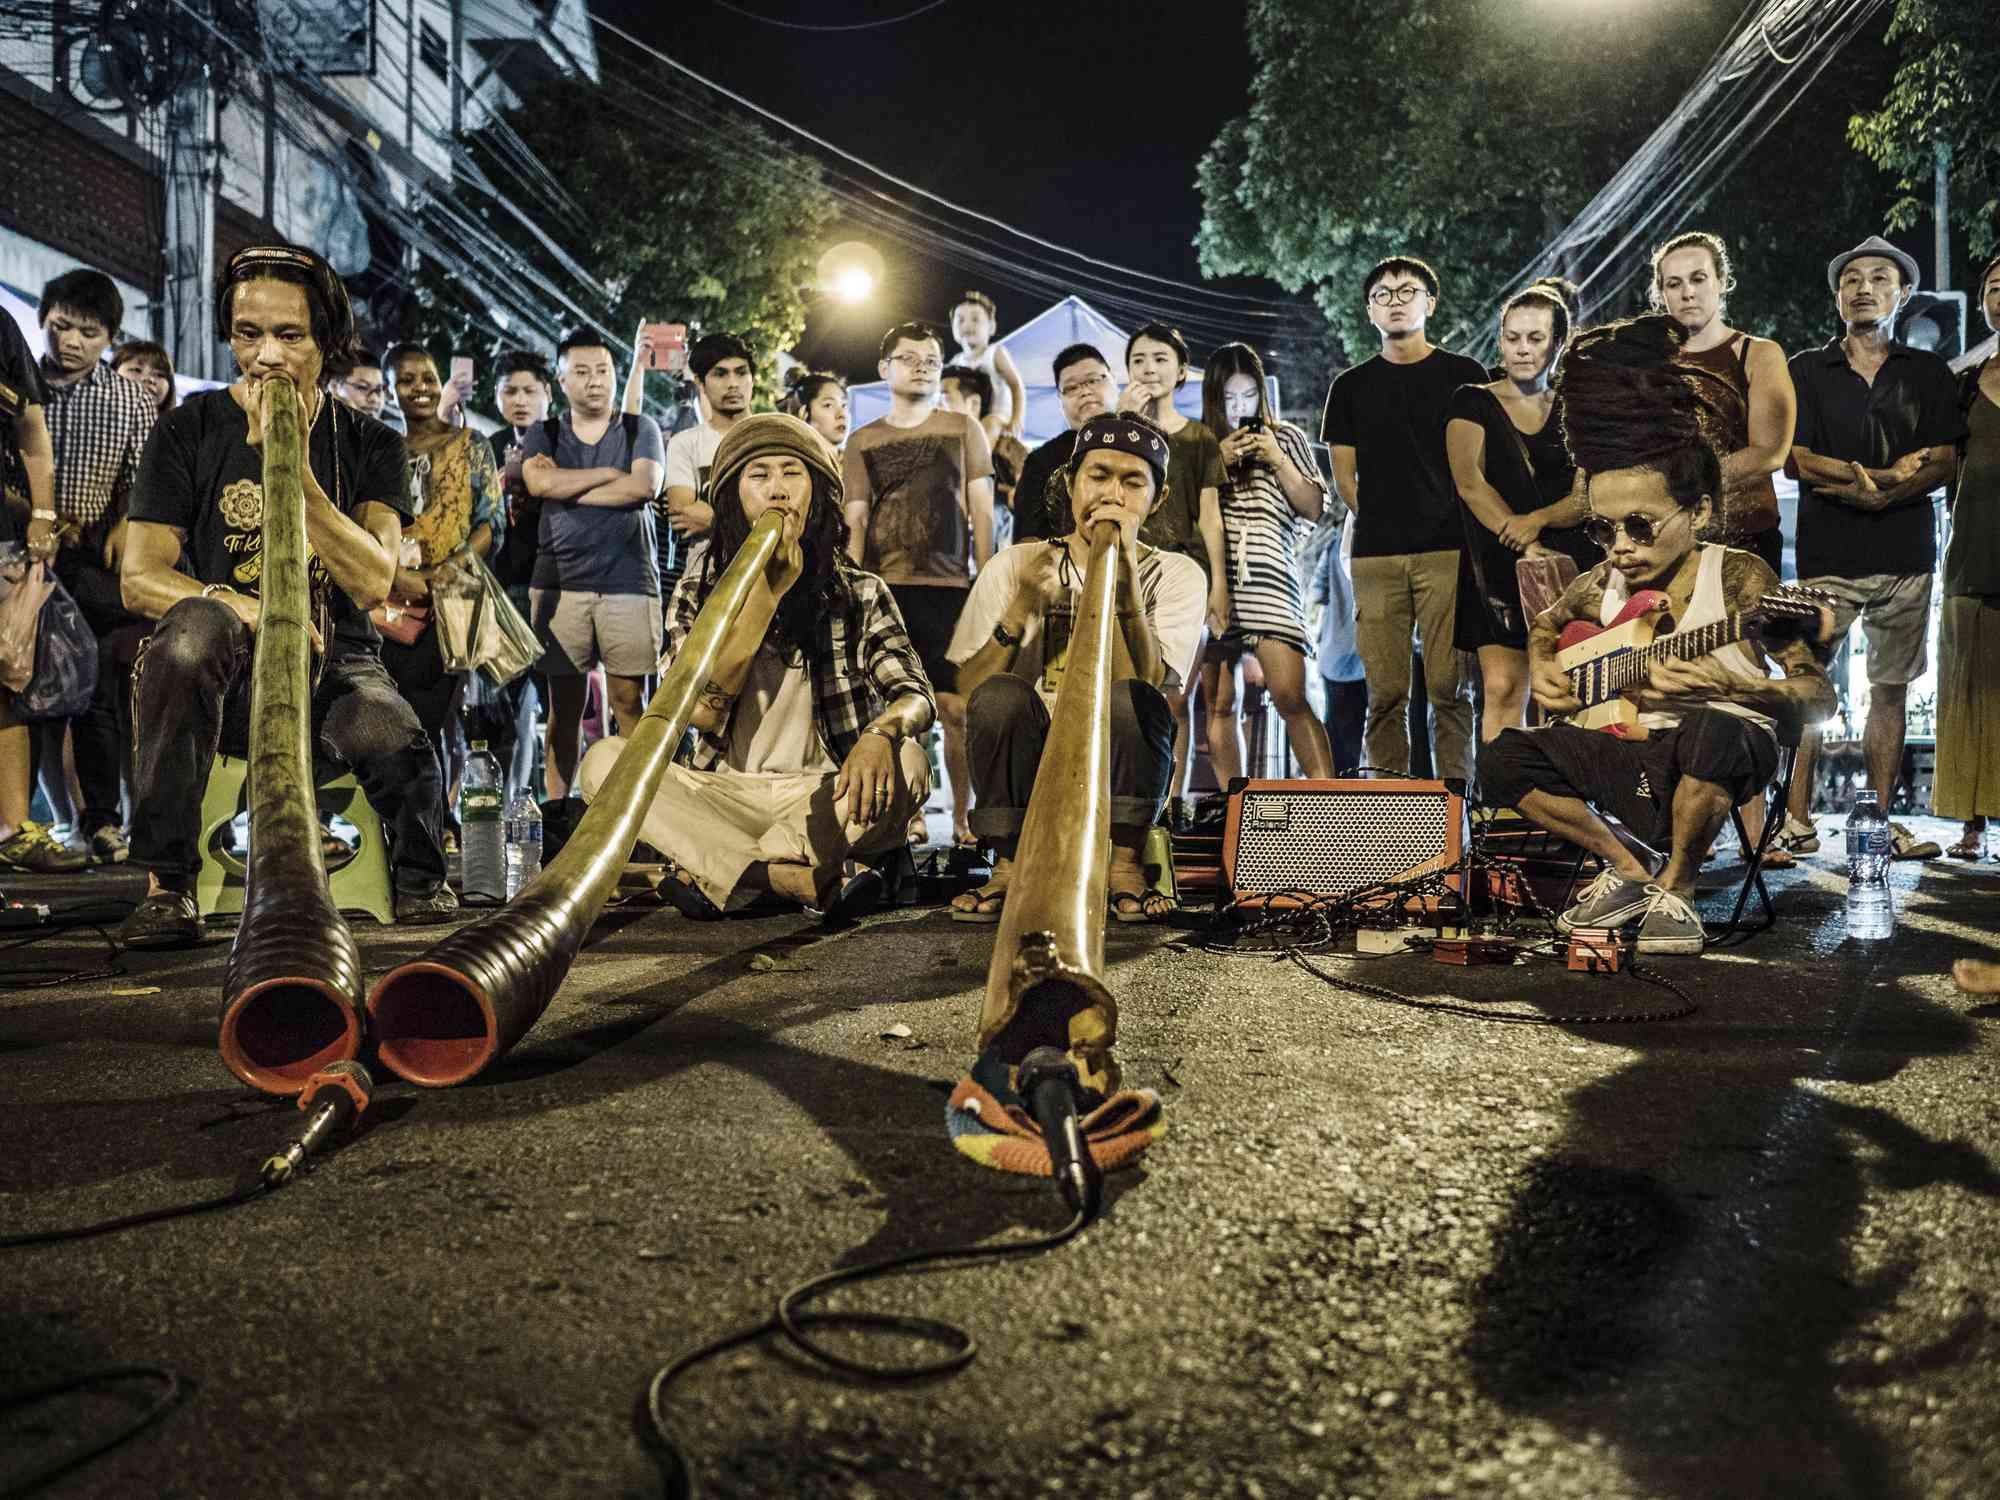 Didgeridoo players at Chiang Mai night market